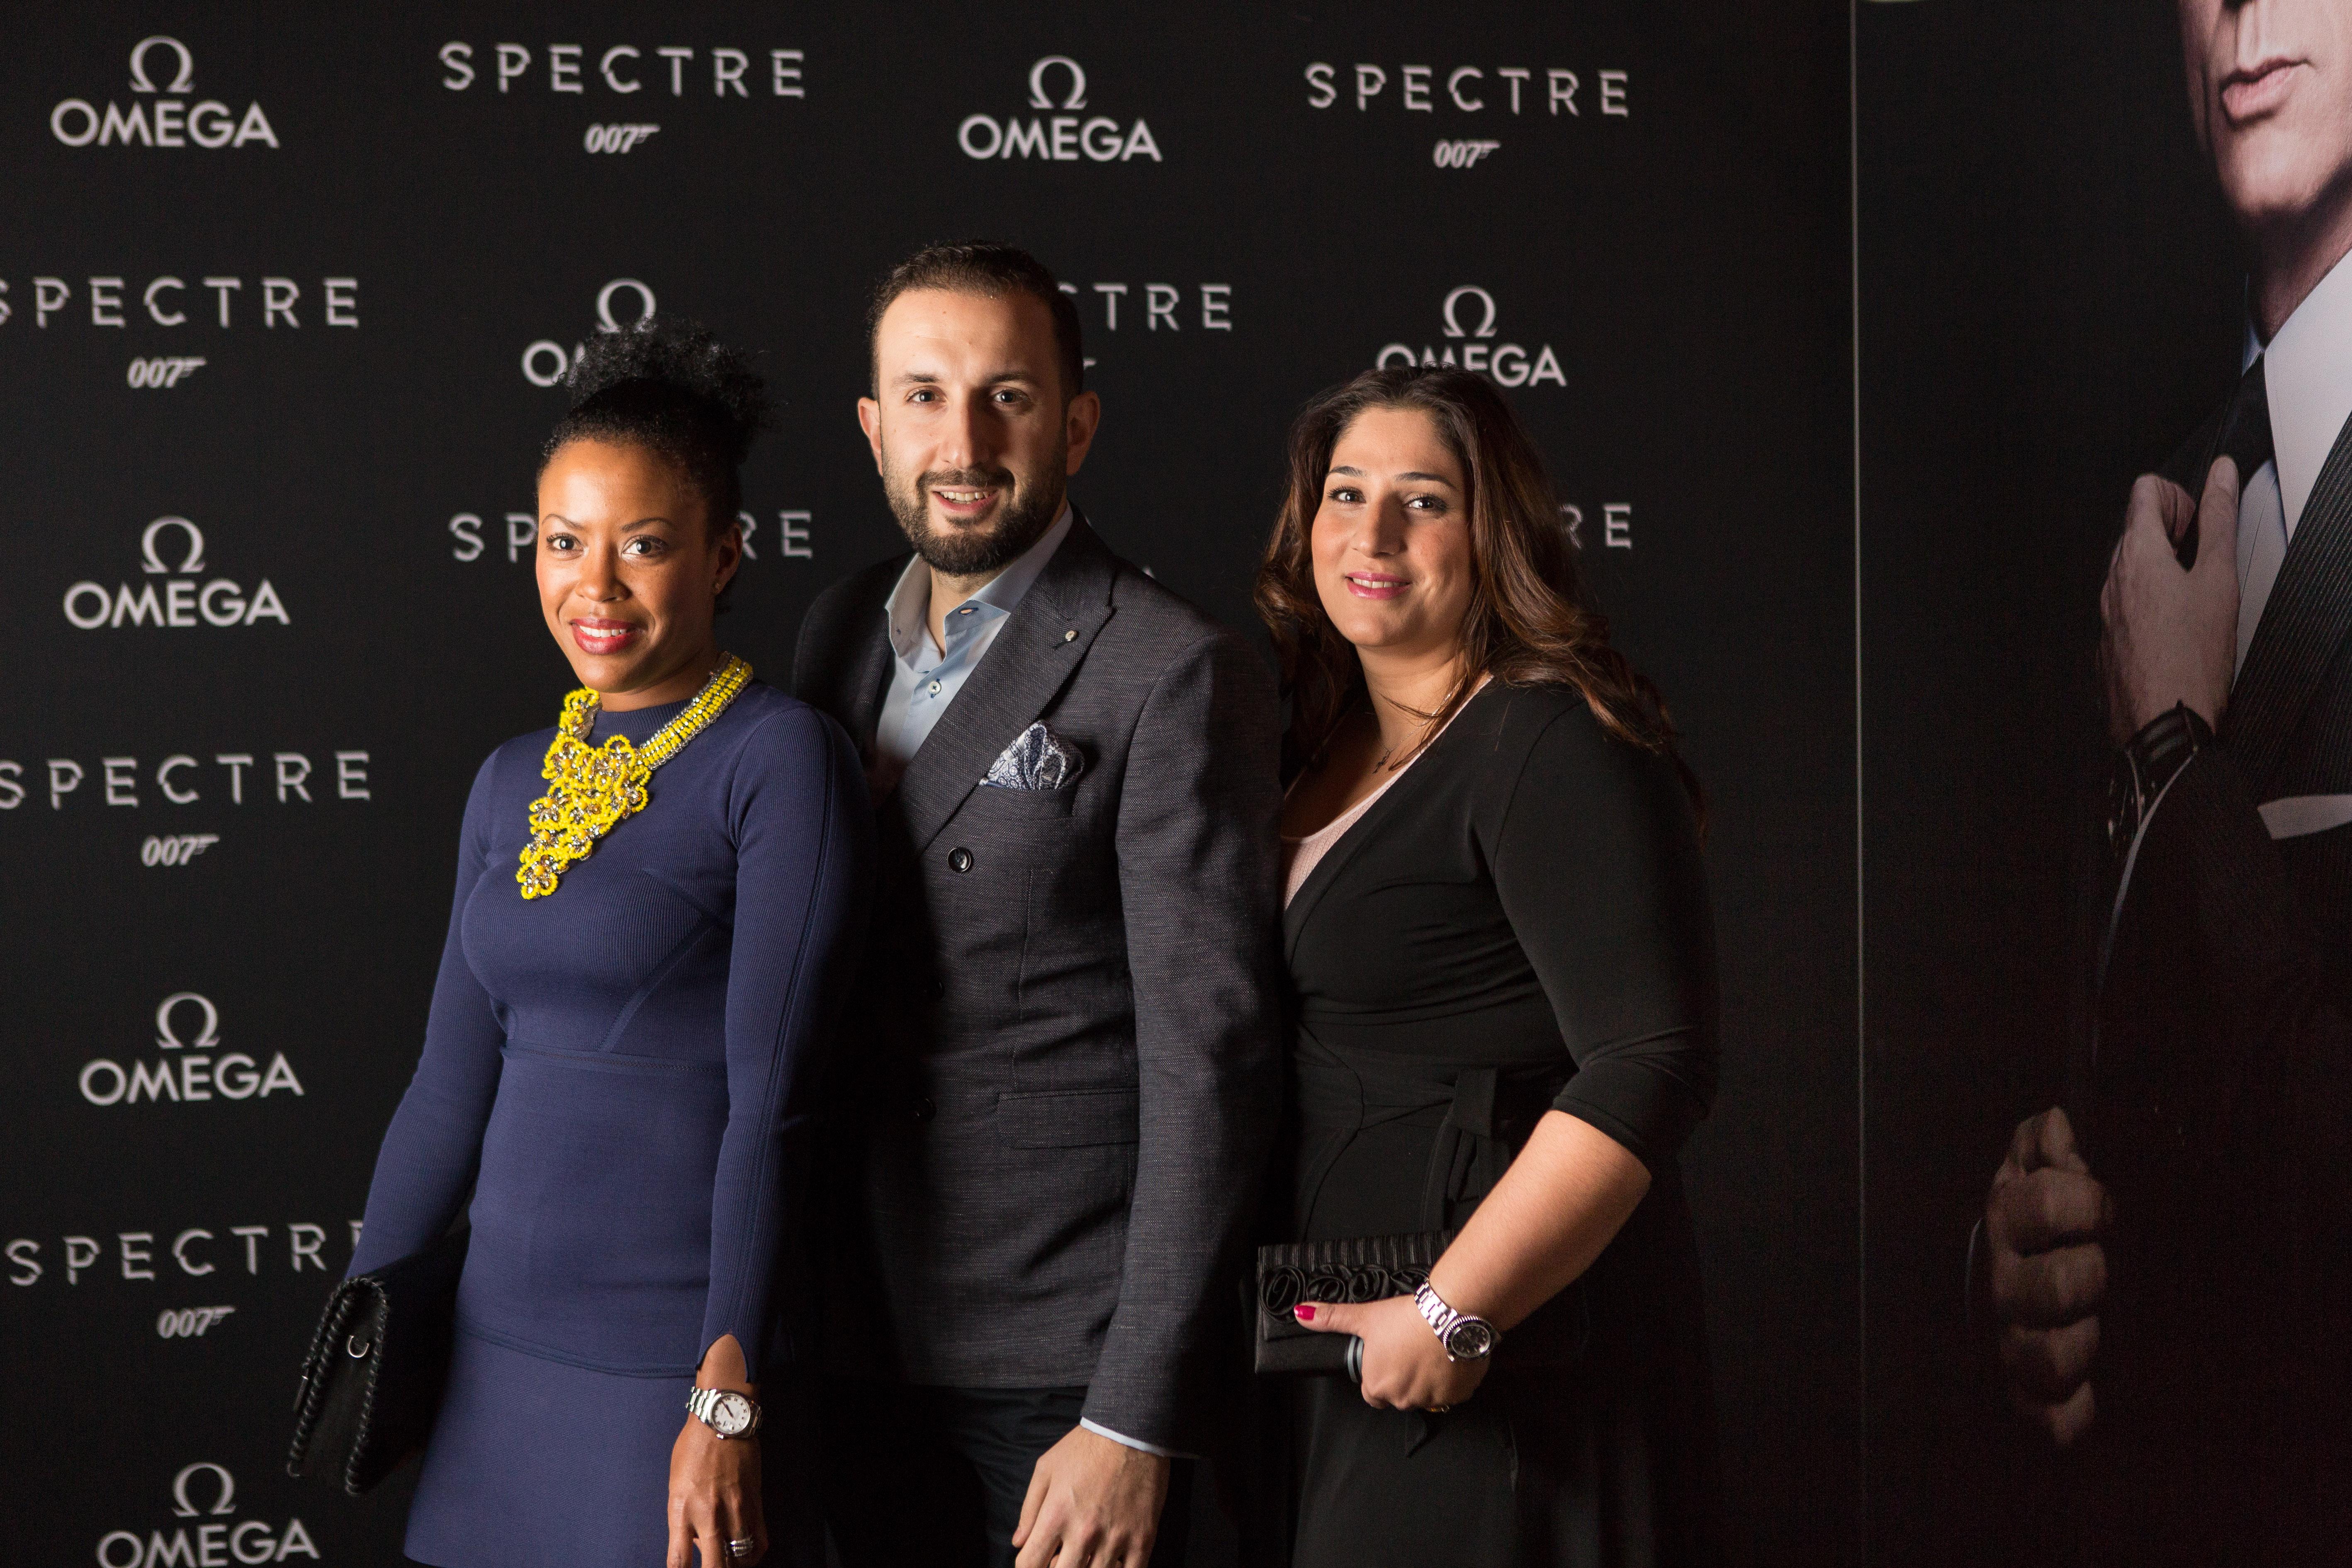 spectre-omega wall-5